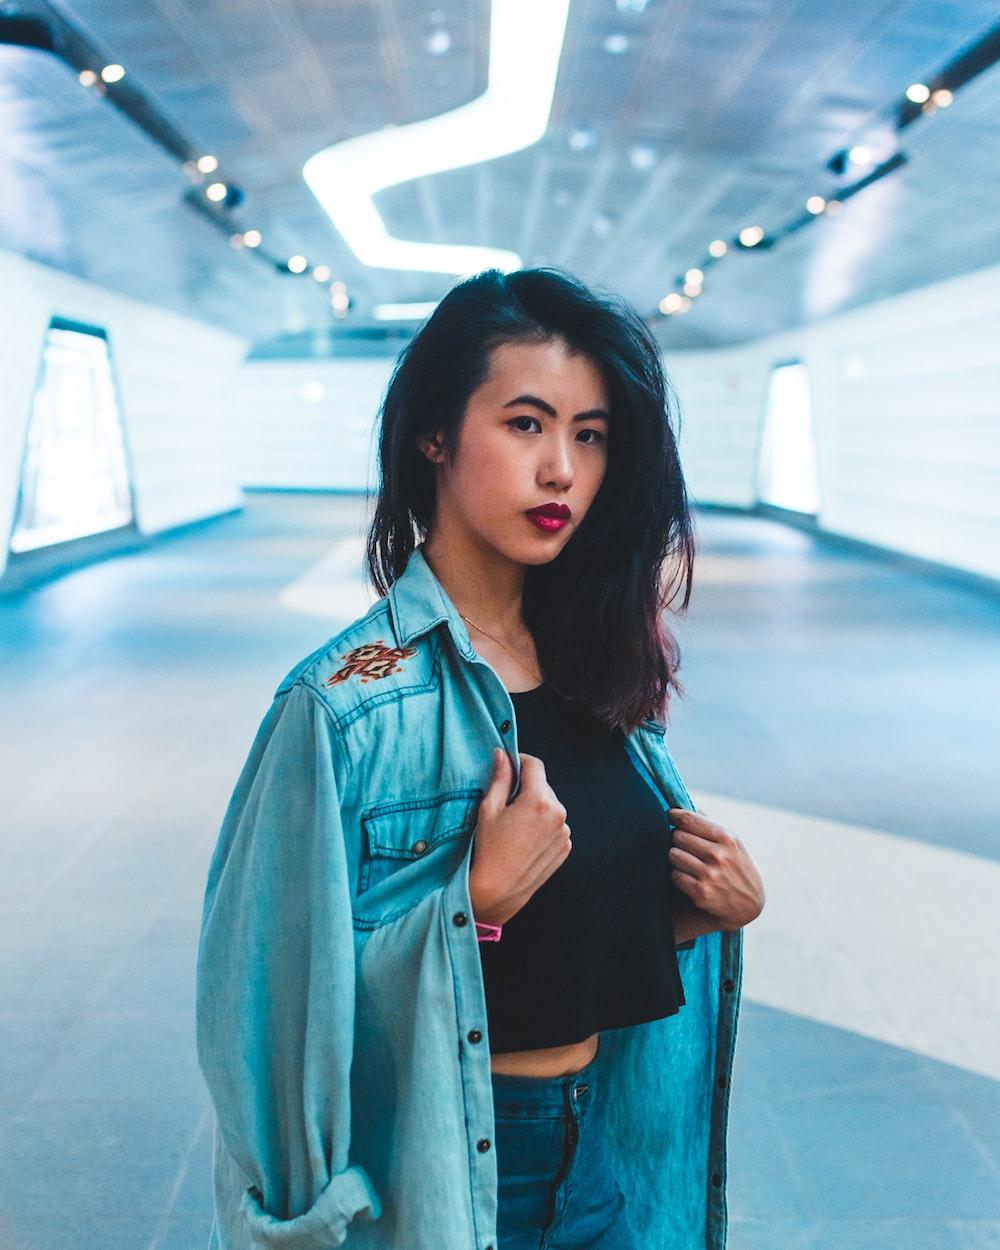 shallow focus photo woman in blue denim jacket